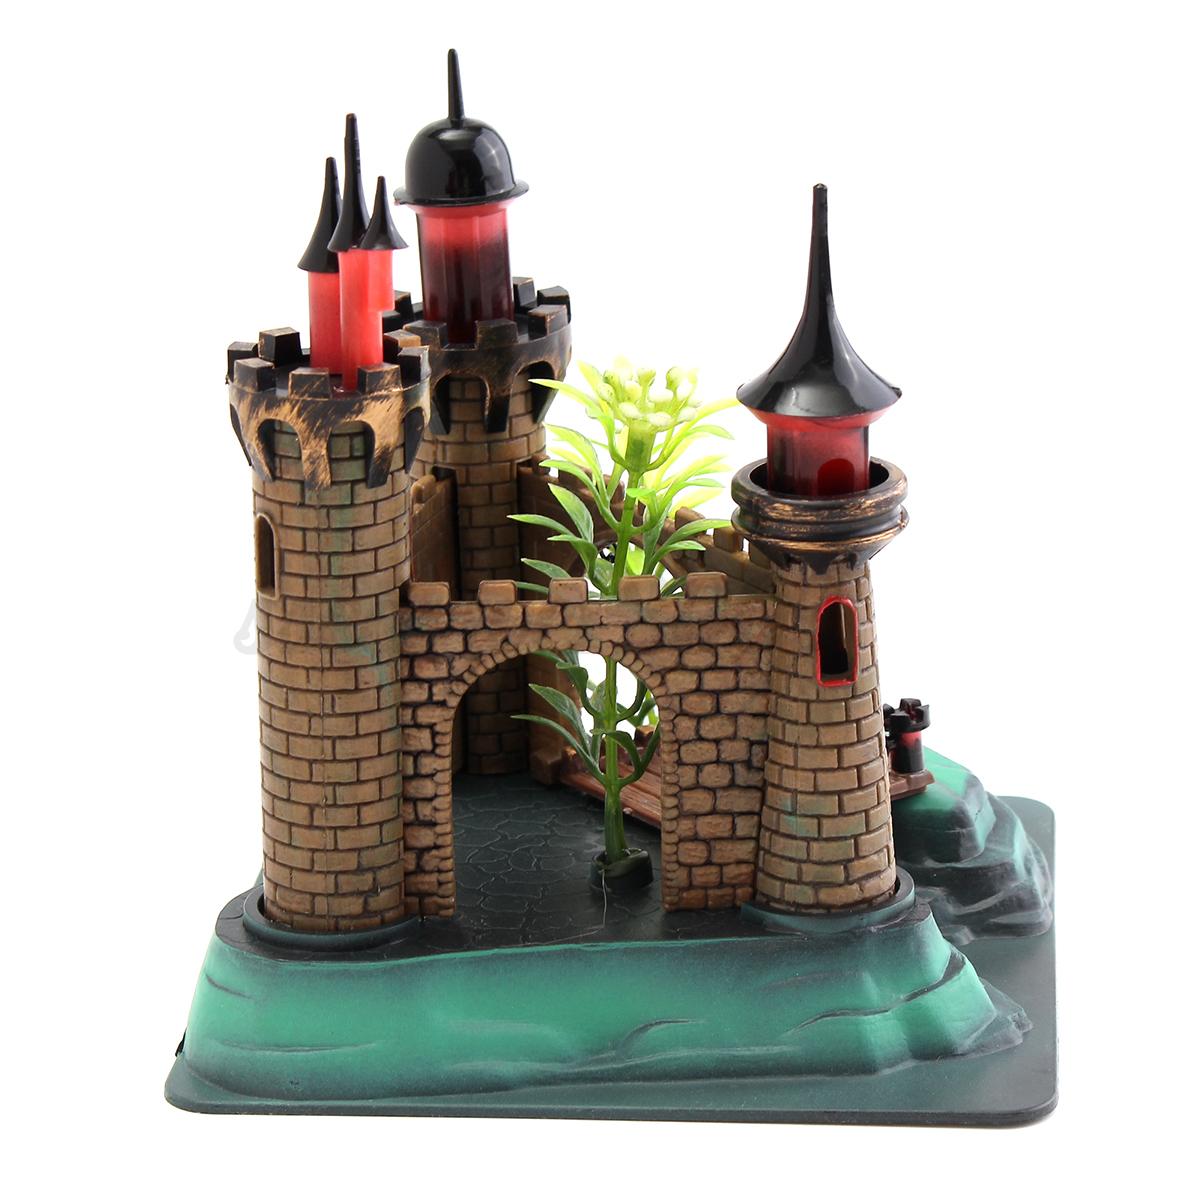 Aquarium resin royal tower castle fish tank ornament fish for Tower fish tank